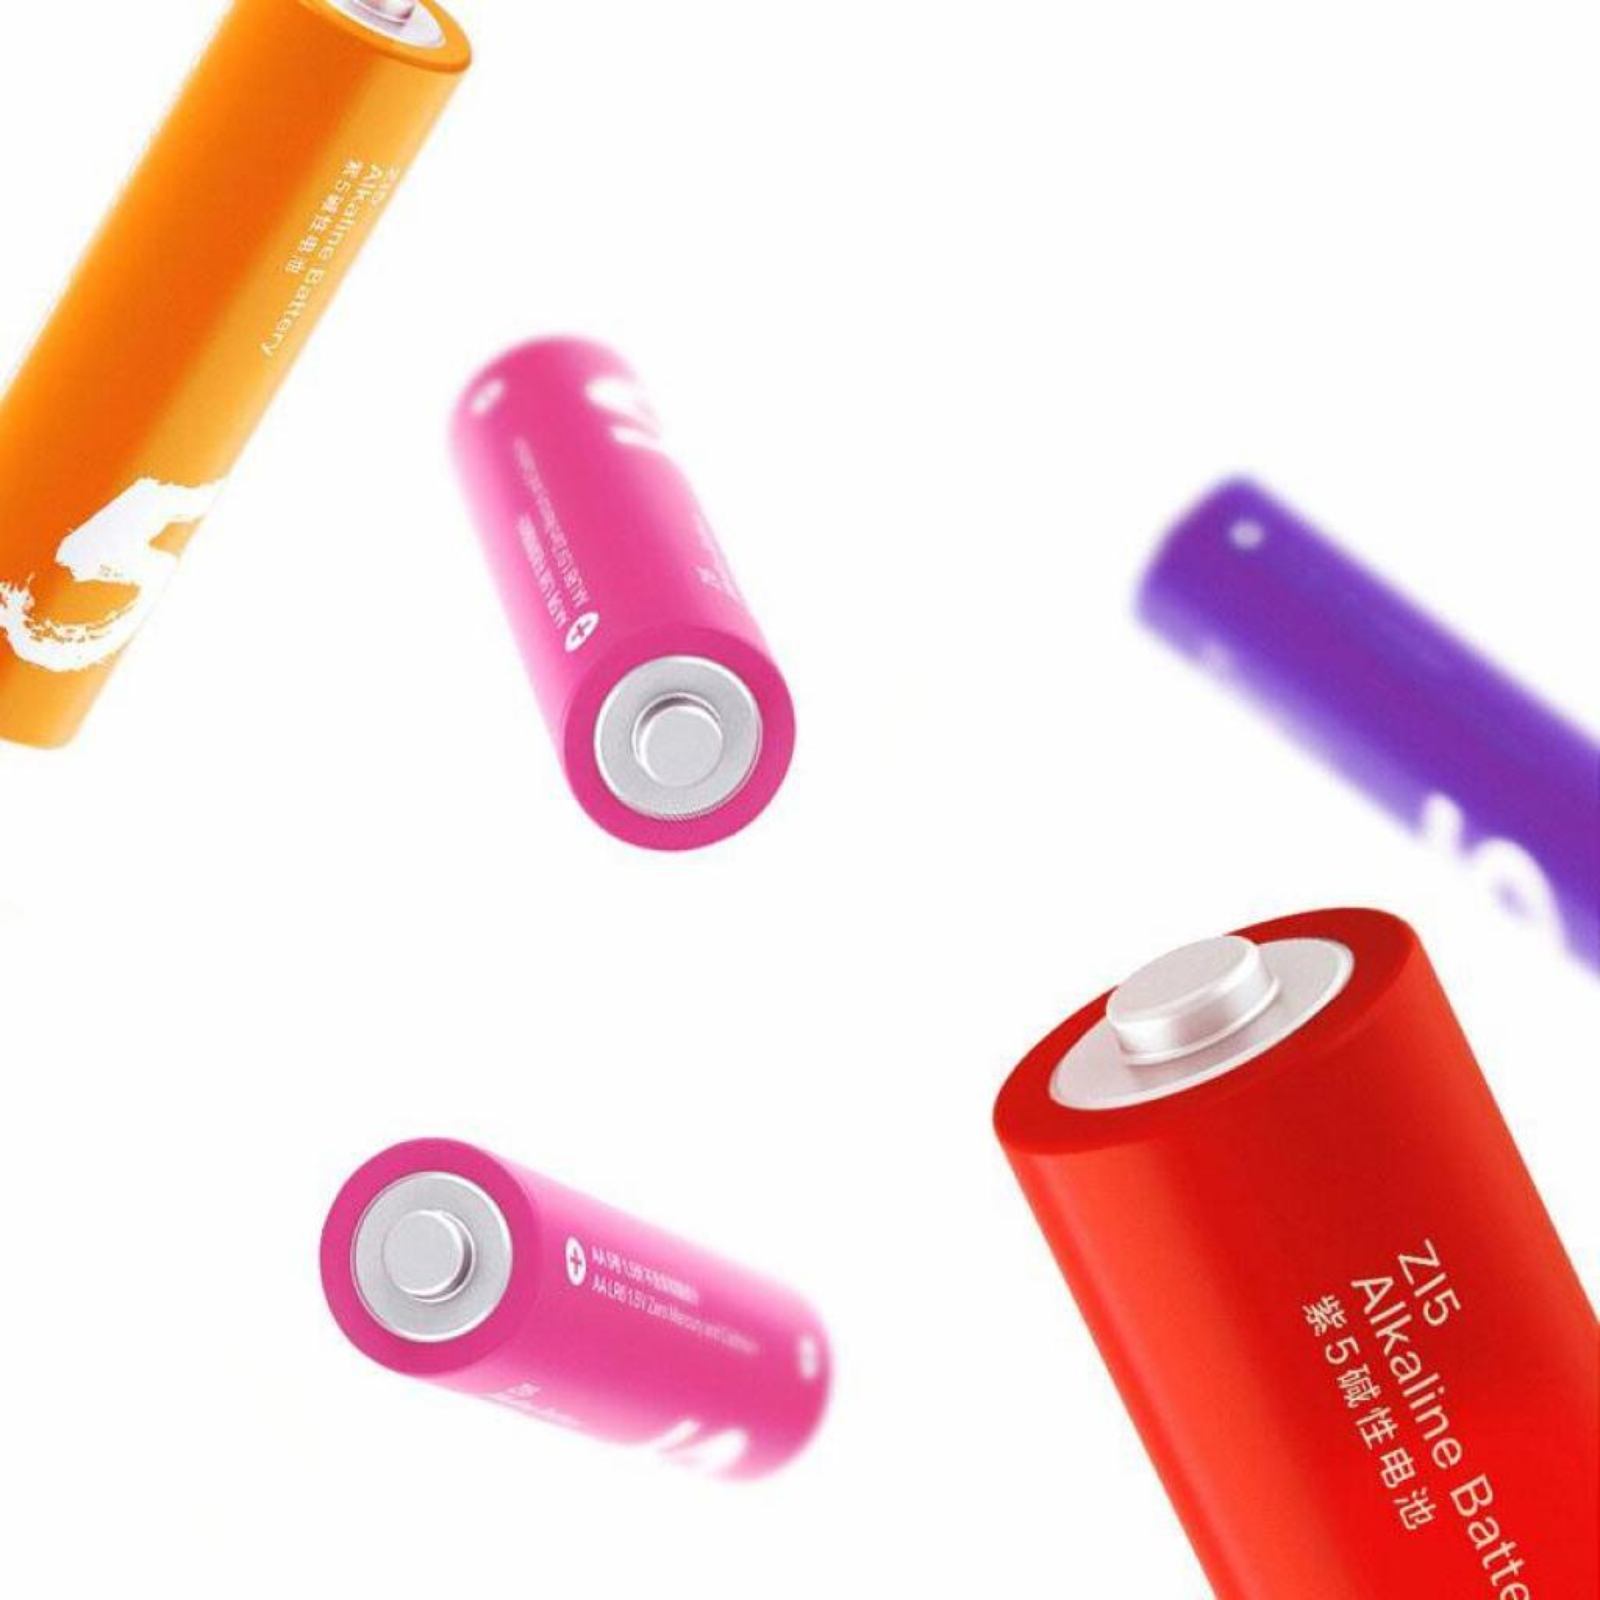 Батарейка ZMI ZI5 Rainbow AA batteries * 24 (Р30402) изображение 4